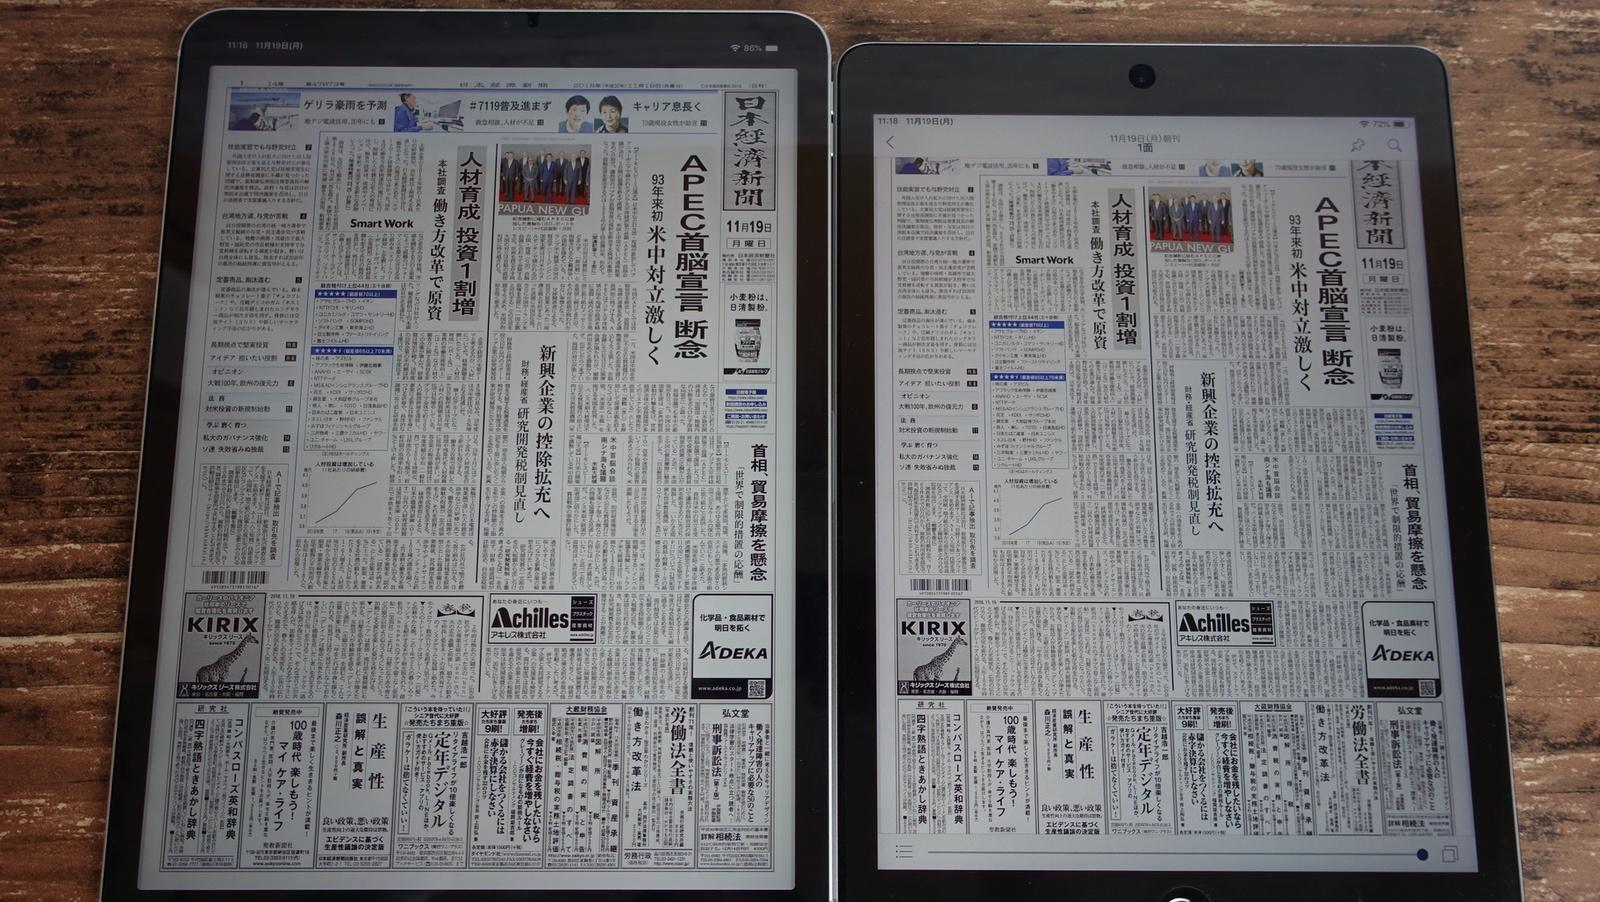 iPad Pro 11インチディスプレイ